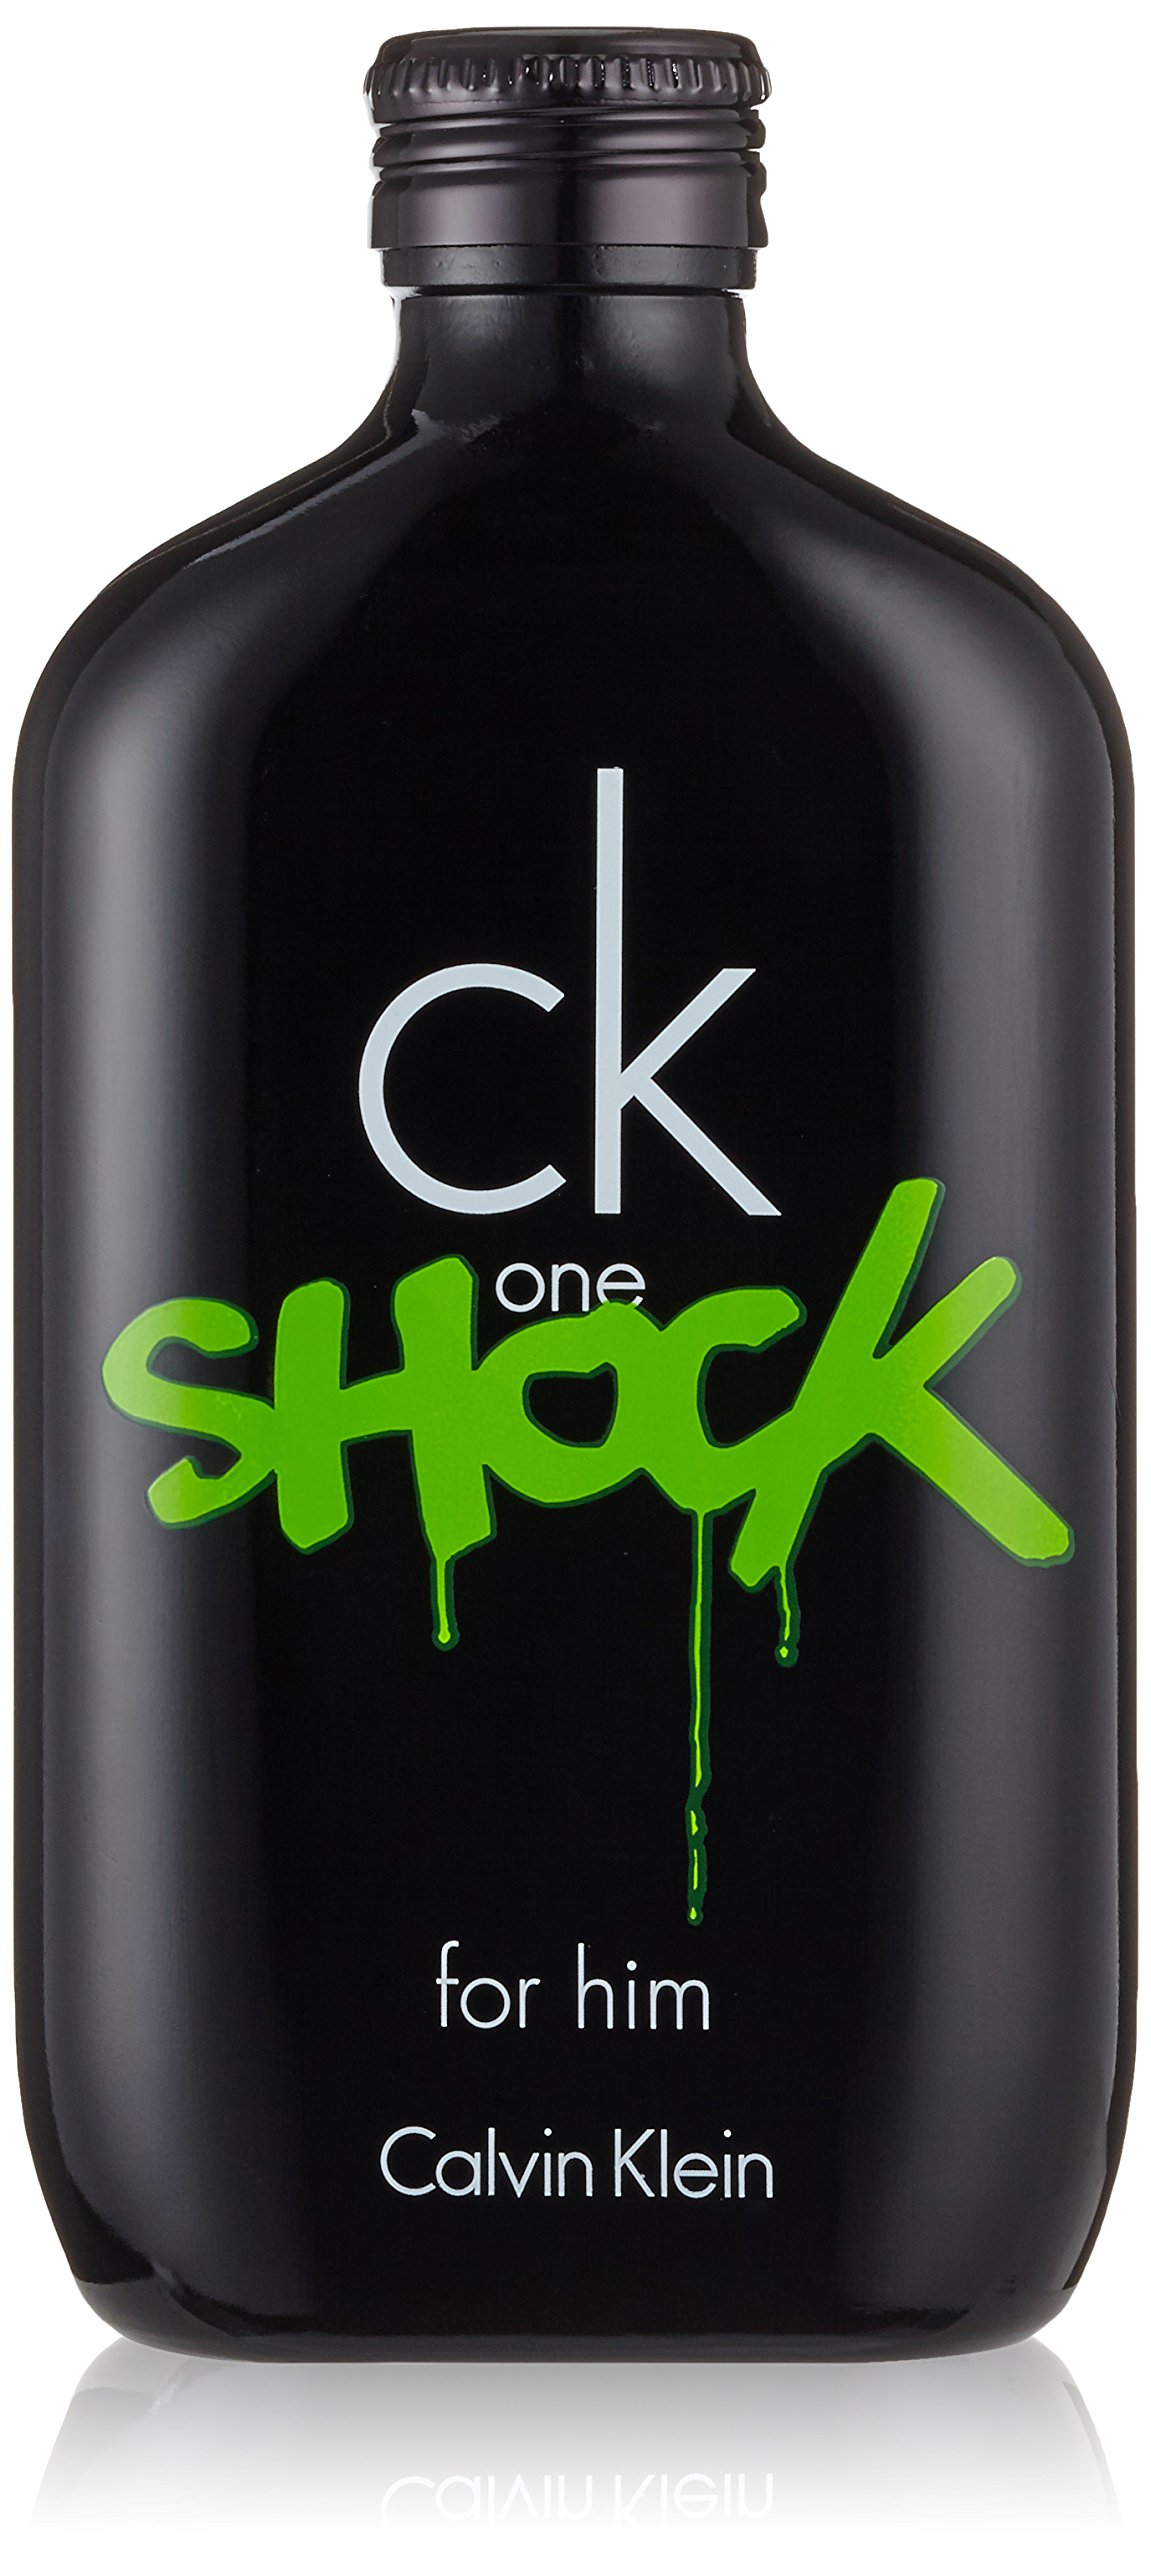 Ck one shock uomo di Calvin Klein - Eau de toilette Edt - Spray 200 ml.